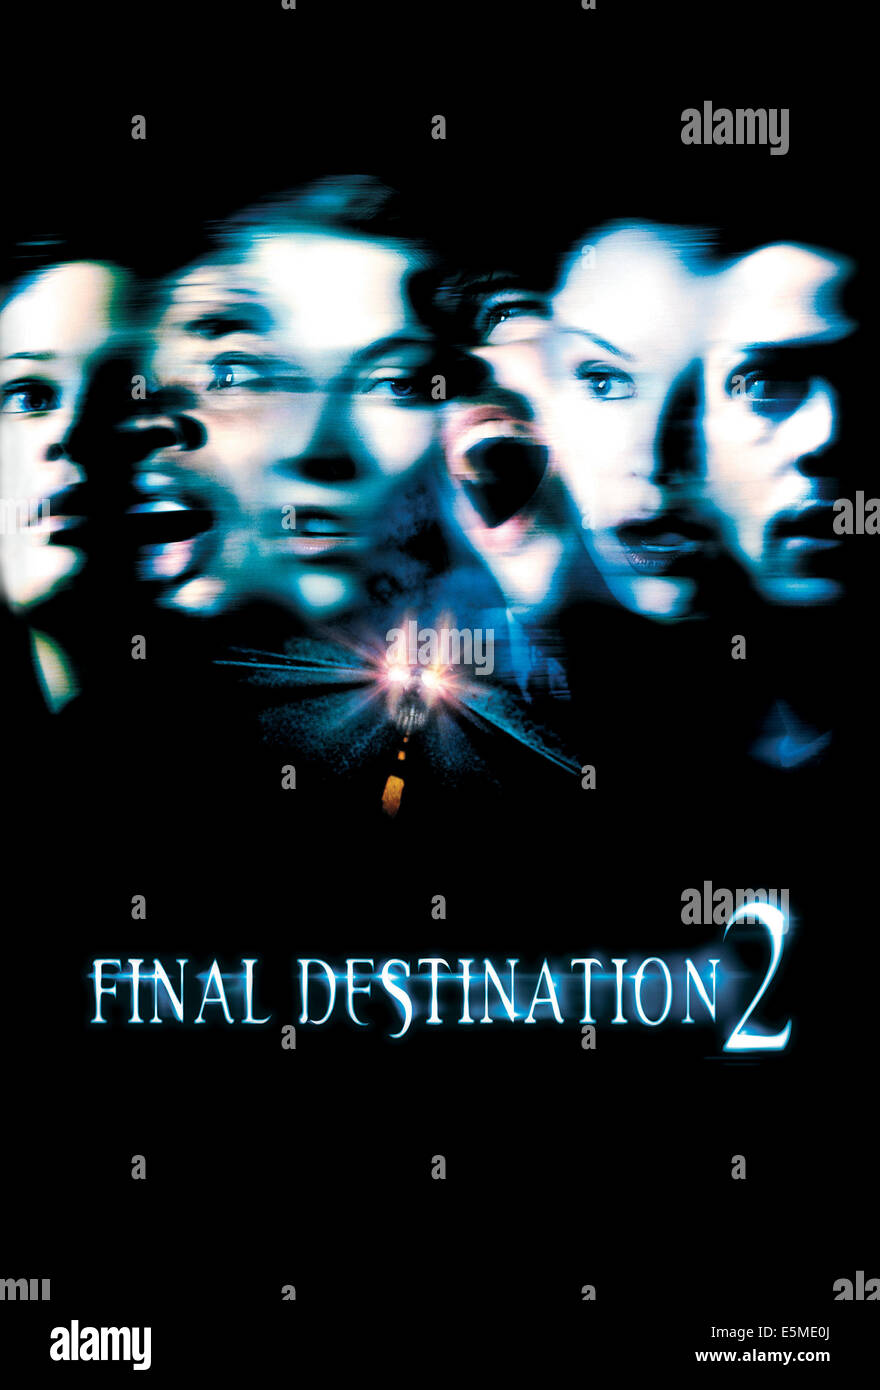 FINAL DESTINATION 2, 2003. (c) New Line Cinema/ Courtesy: Everett Collection. - Stock Image